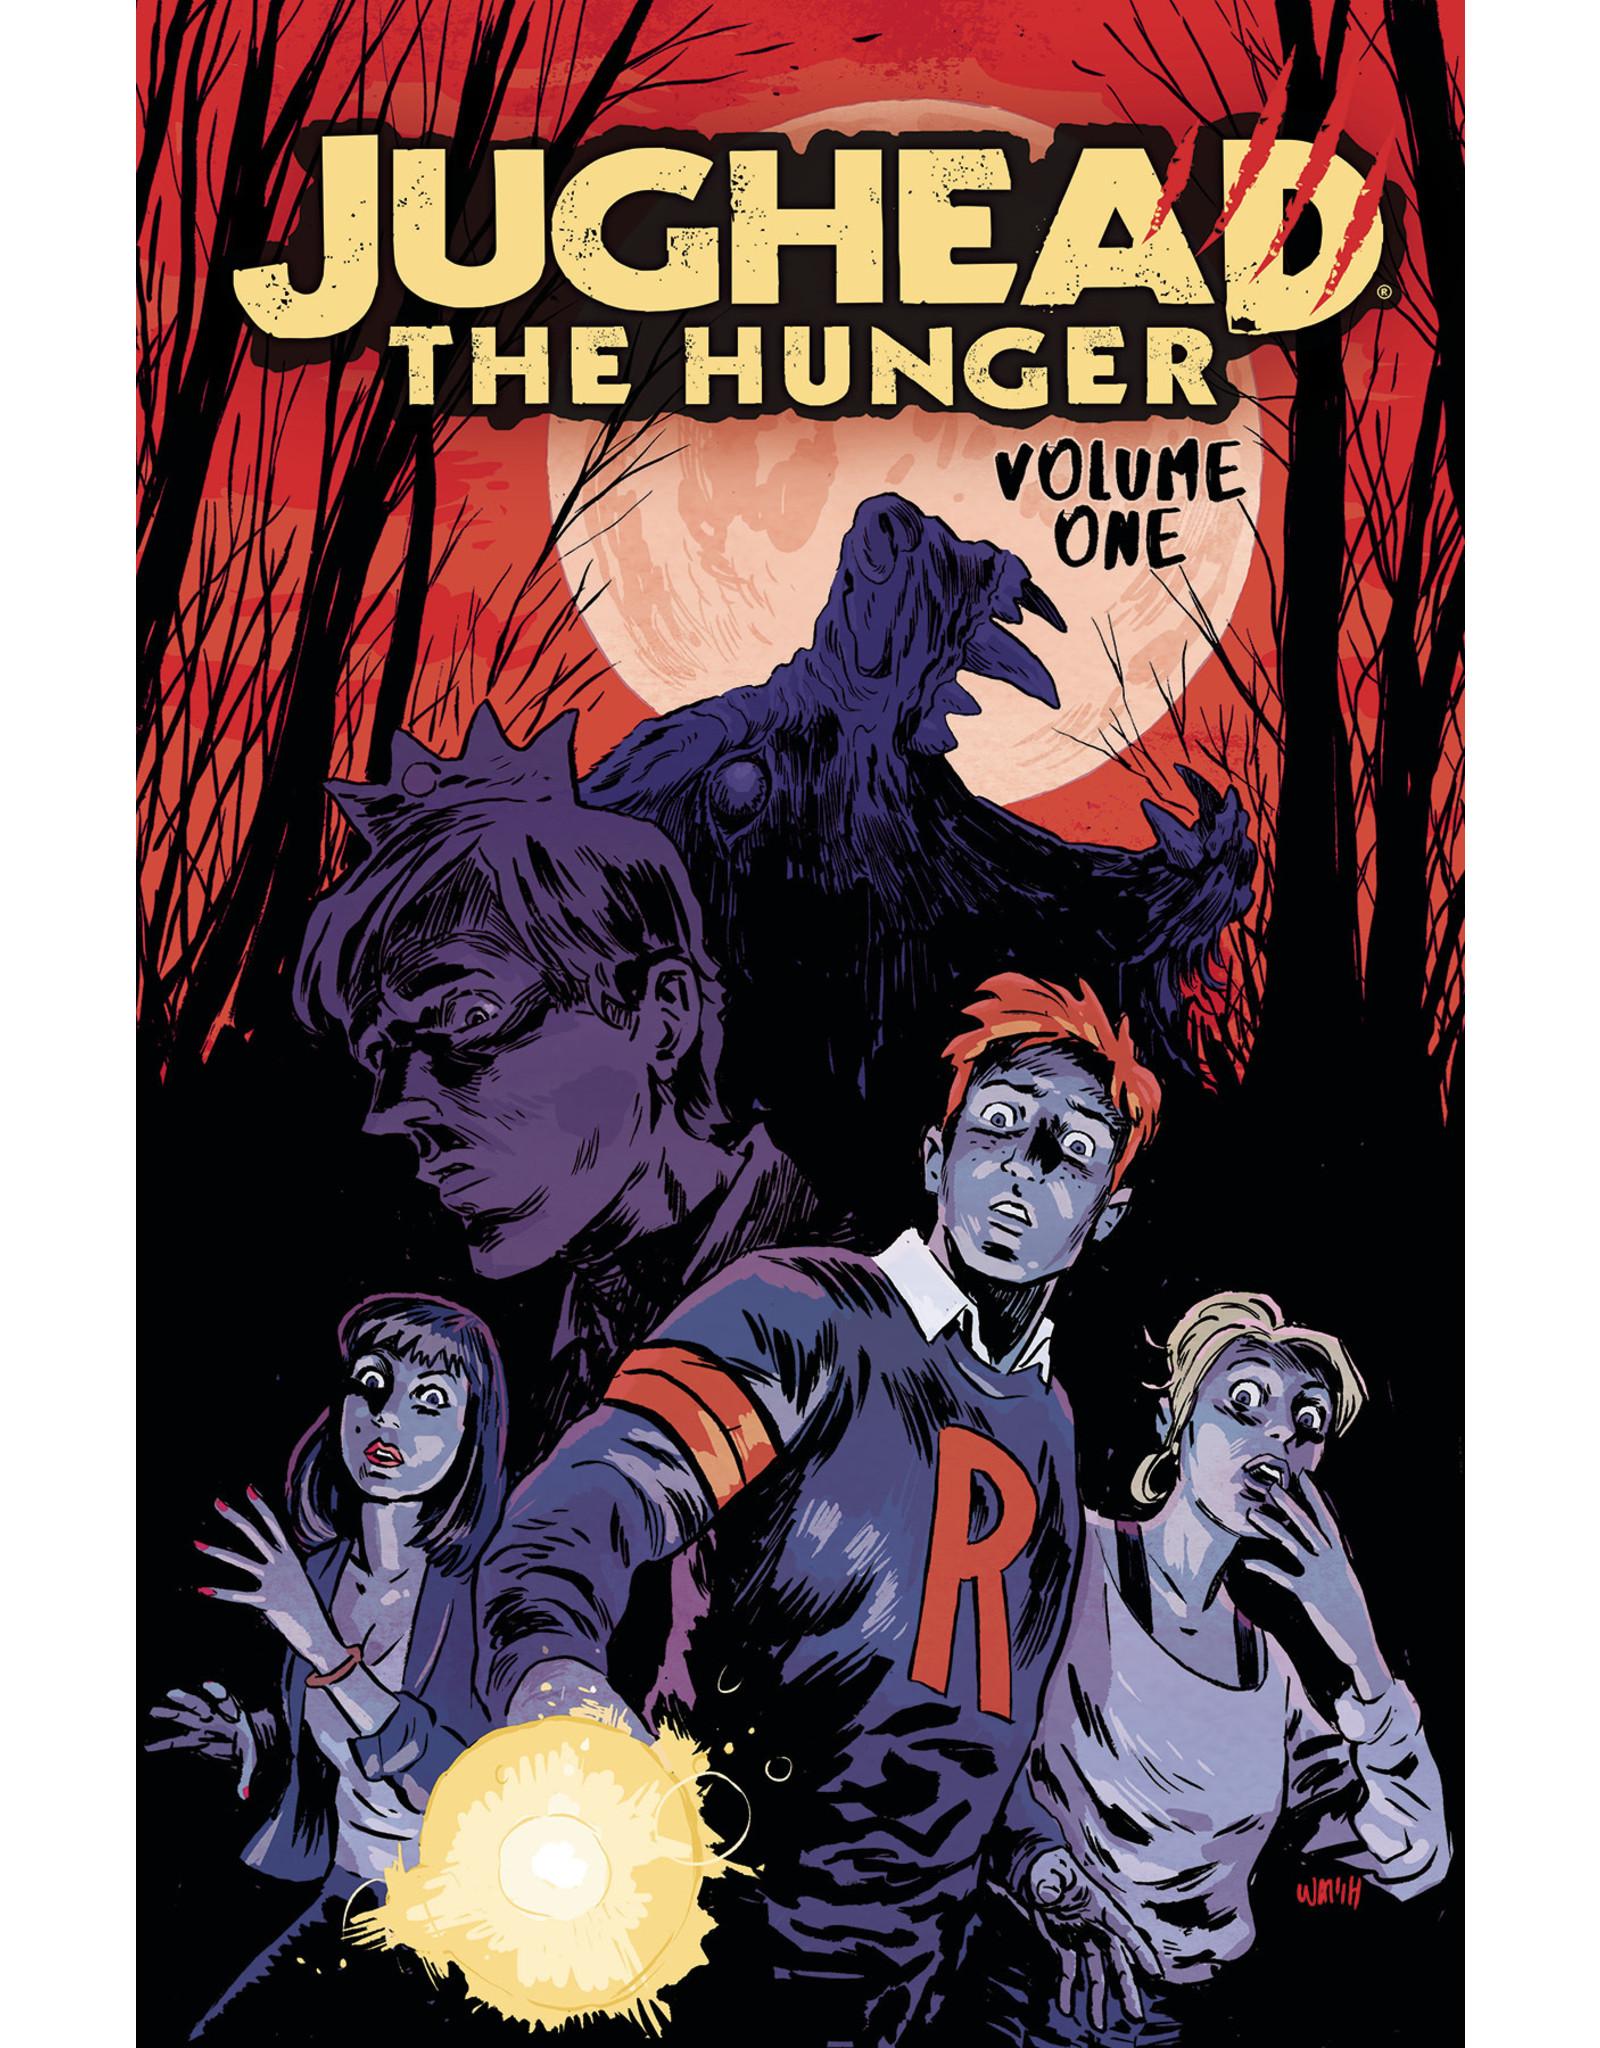 ARCHIE COMIC PUBLICATIONS JUGHEAD HUNGER TP VOL 01